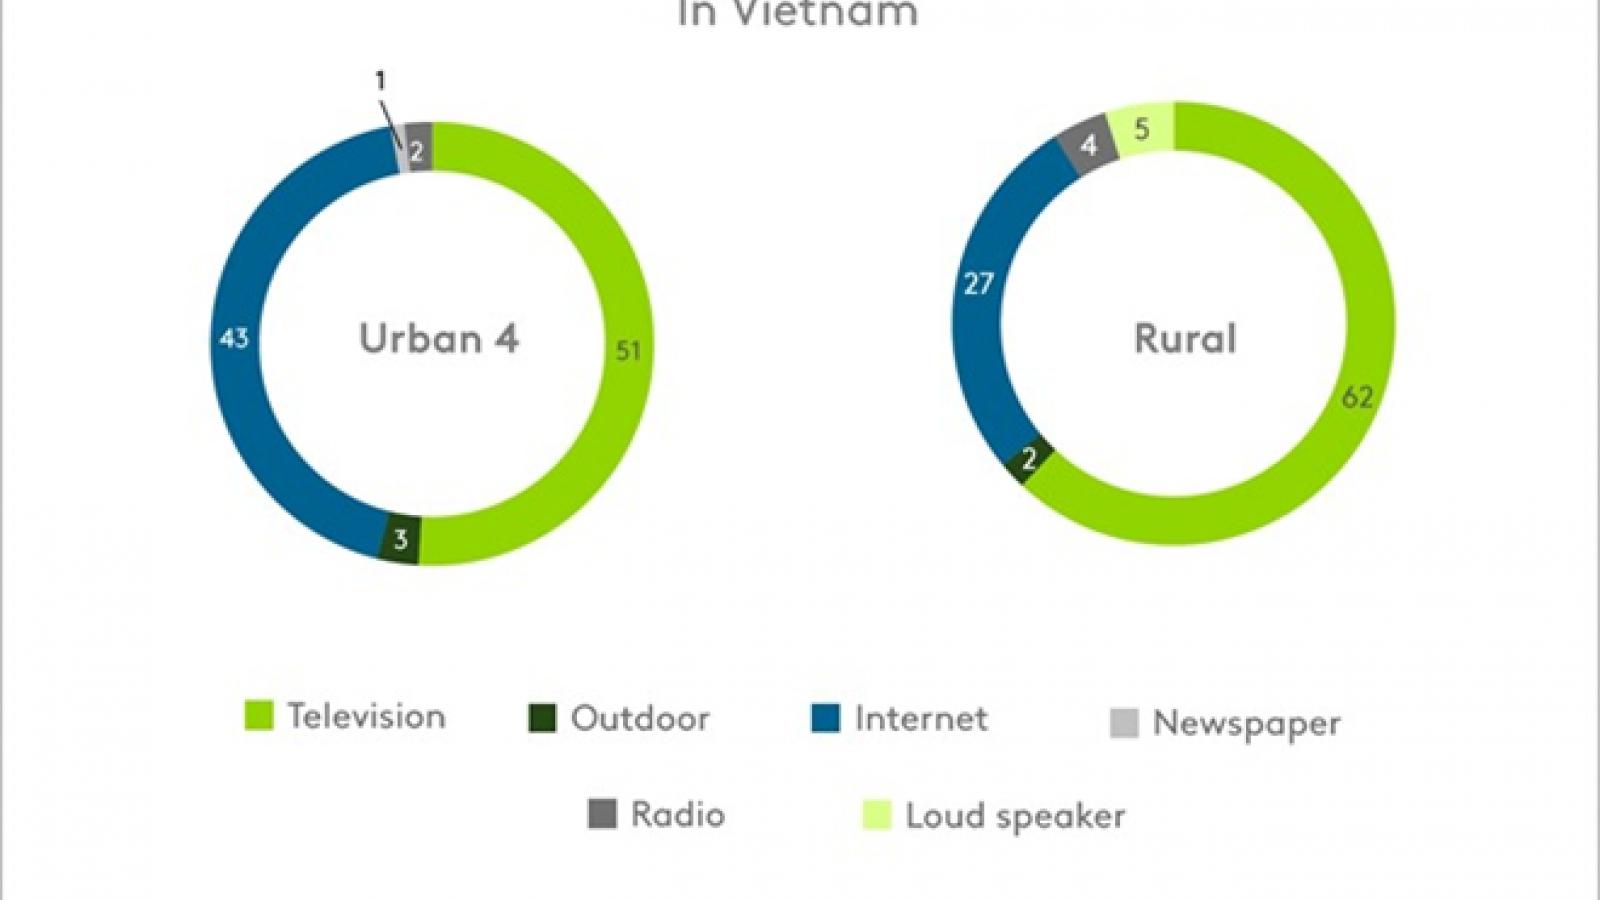 Vietnam to spend US$2.9 billion on advertising